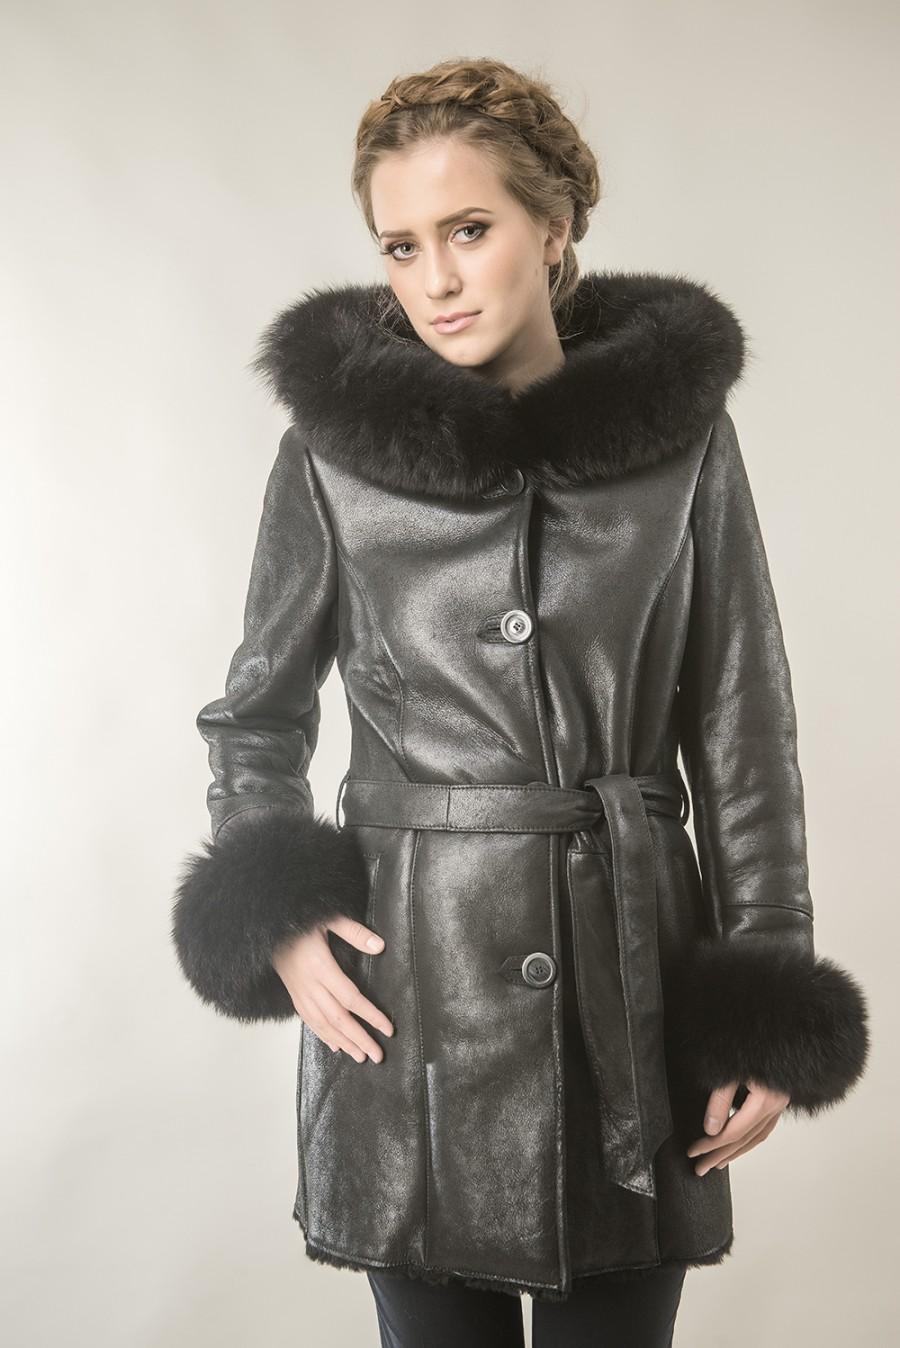 e83da52b3 Womens fur coat made with nappa leather and fox fur